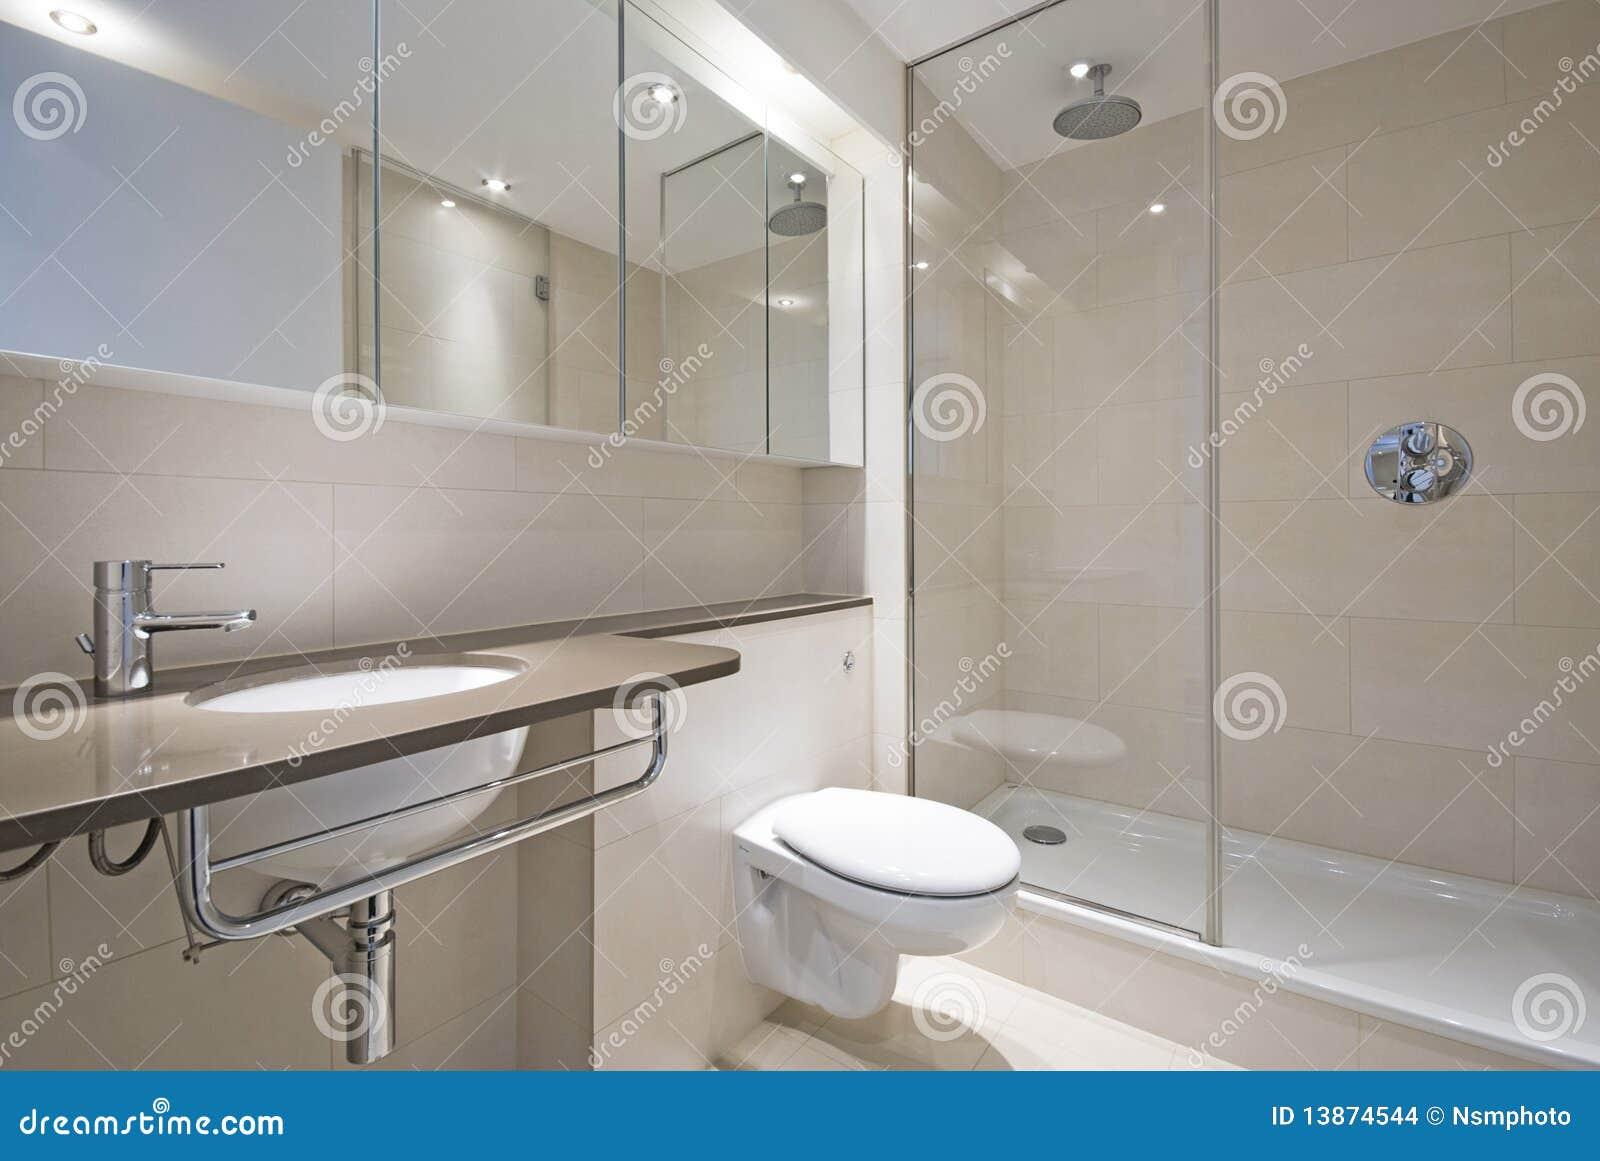 Moderne badkamers met het bassin van de ontwerperwas